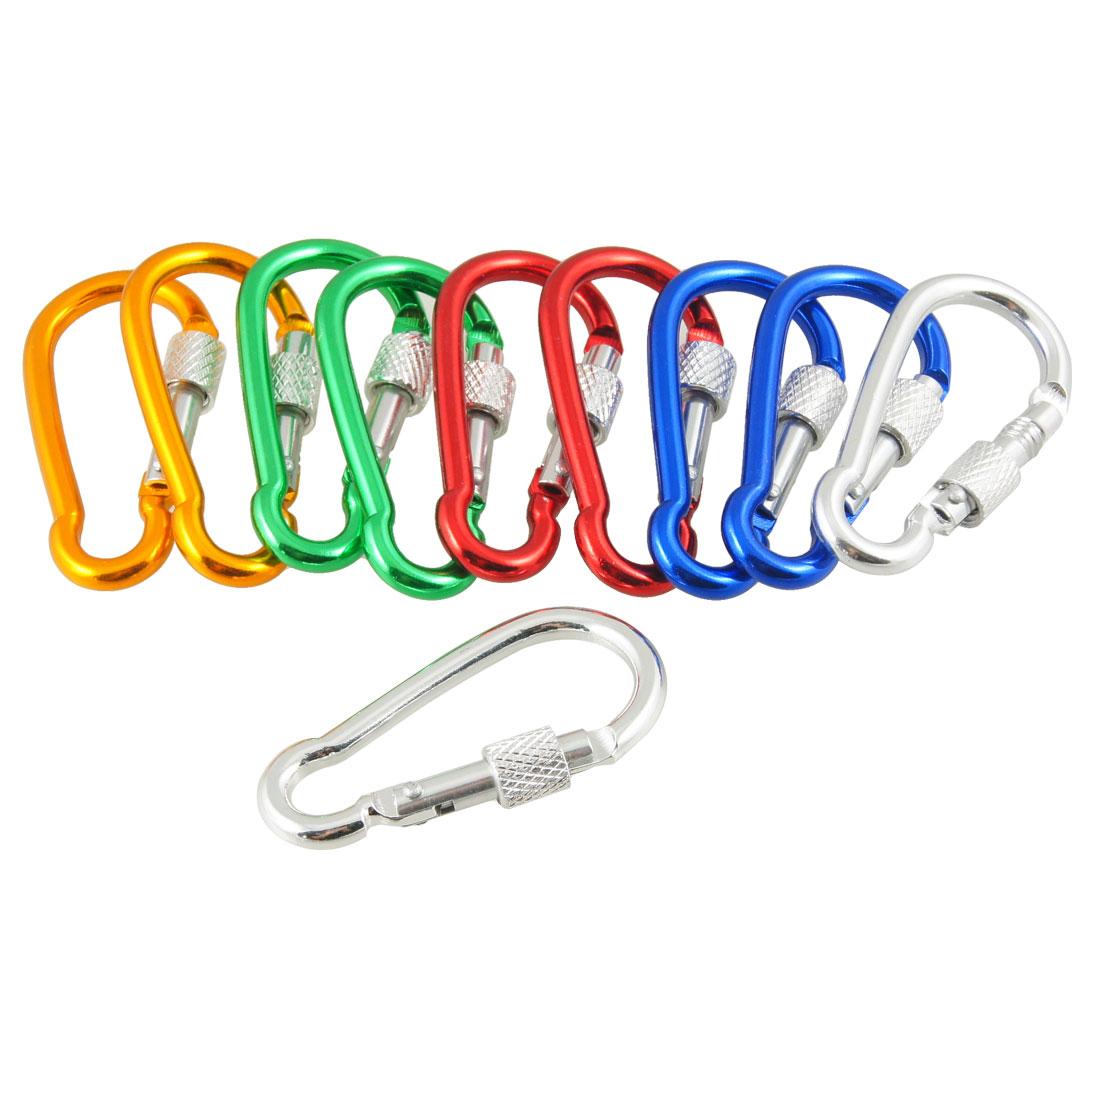 10 Pcs Assorted Color Aluminum Alloy Carabiner Clip Hook Bottle Holders